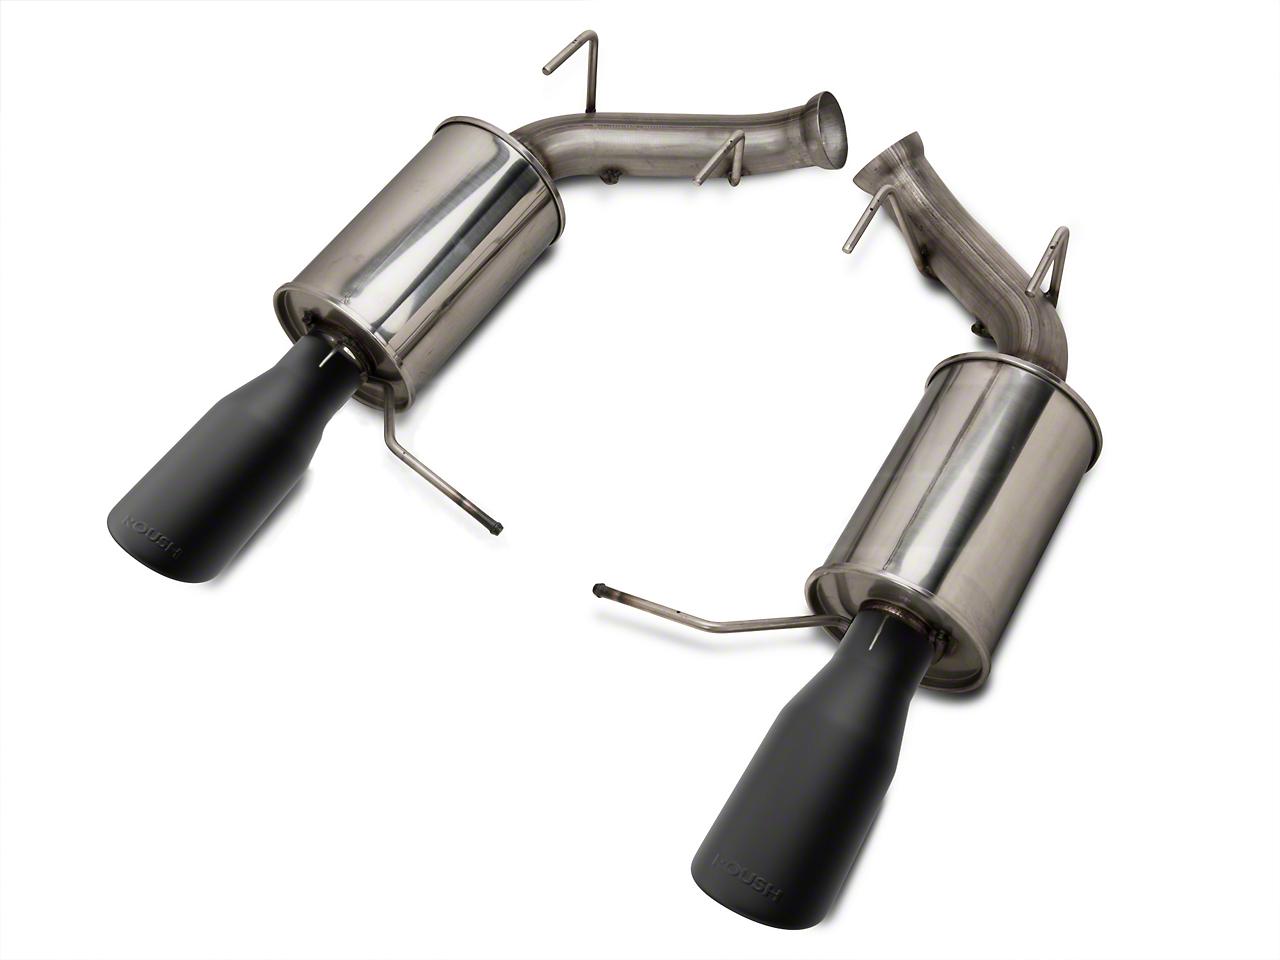 Roush Axle-Back Exhaust w/ Black Tips (11-14 GT; 11-12 GT500)